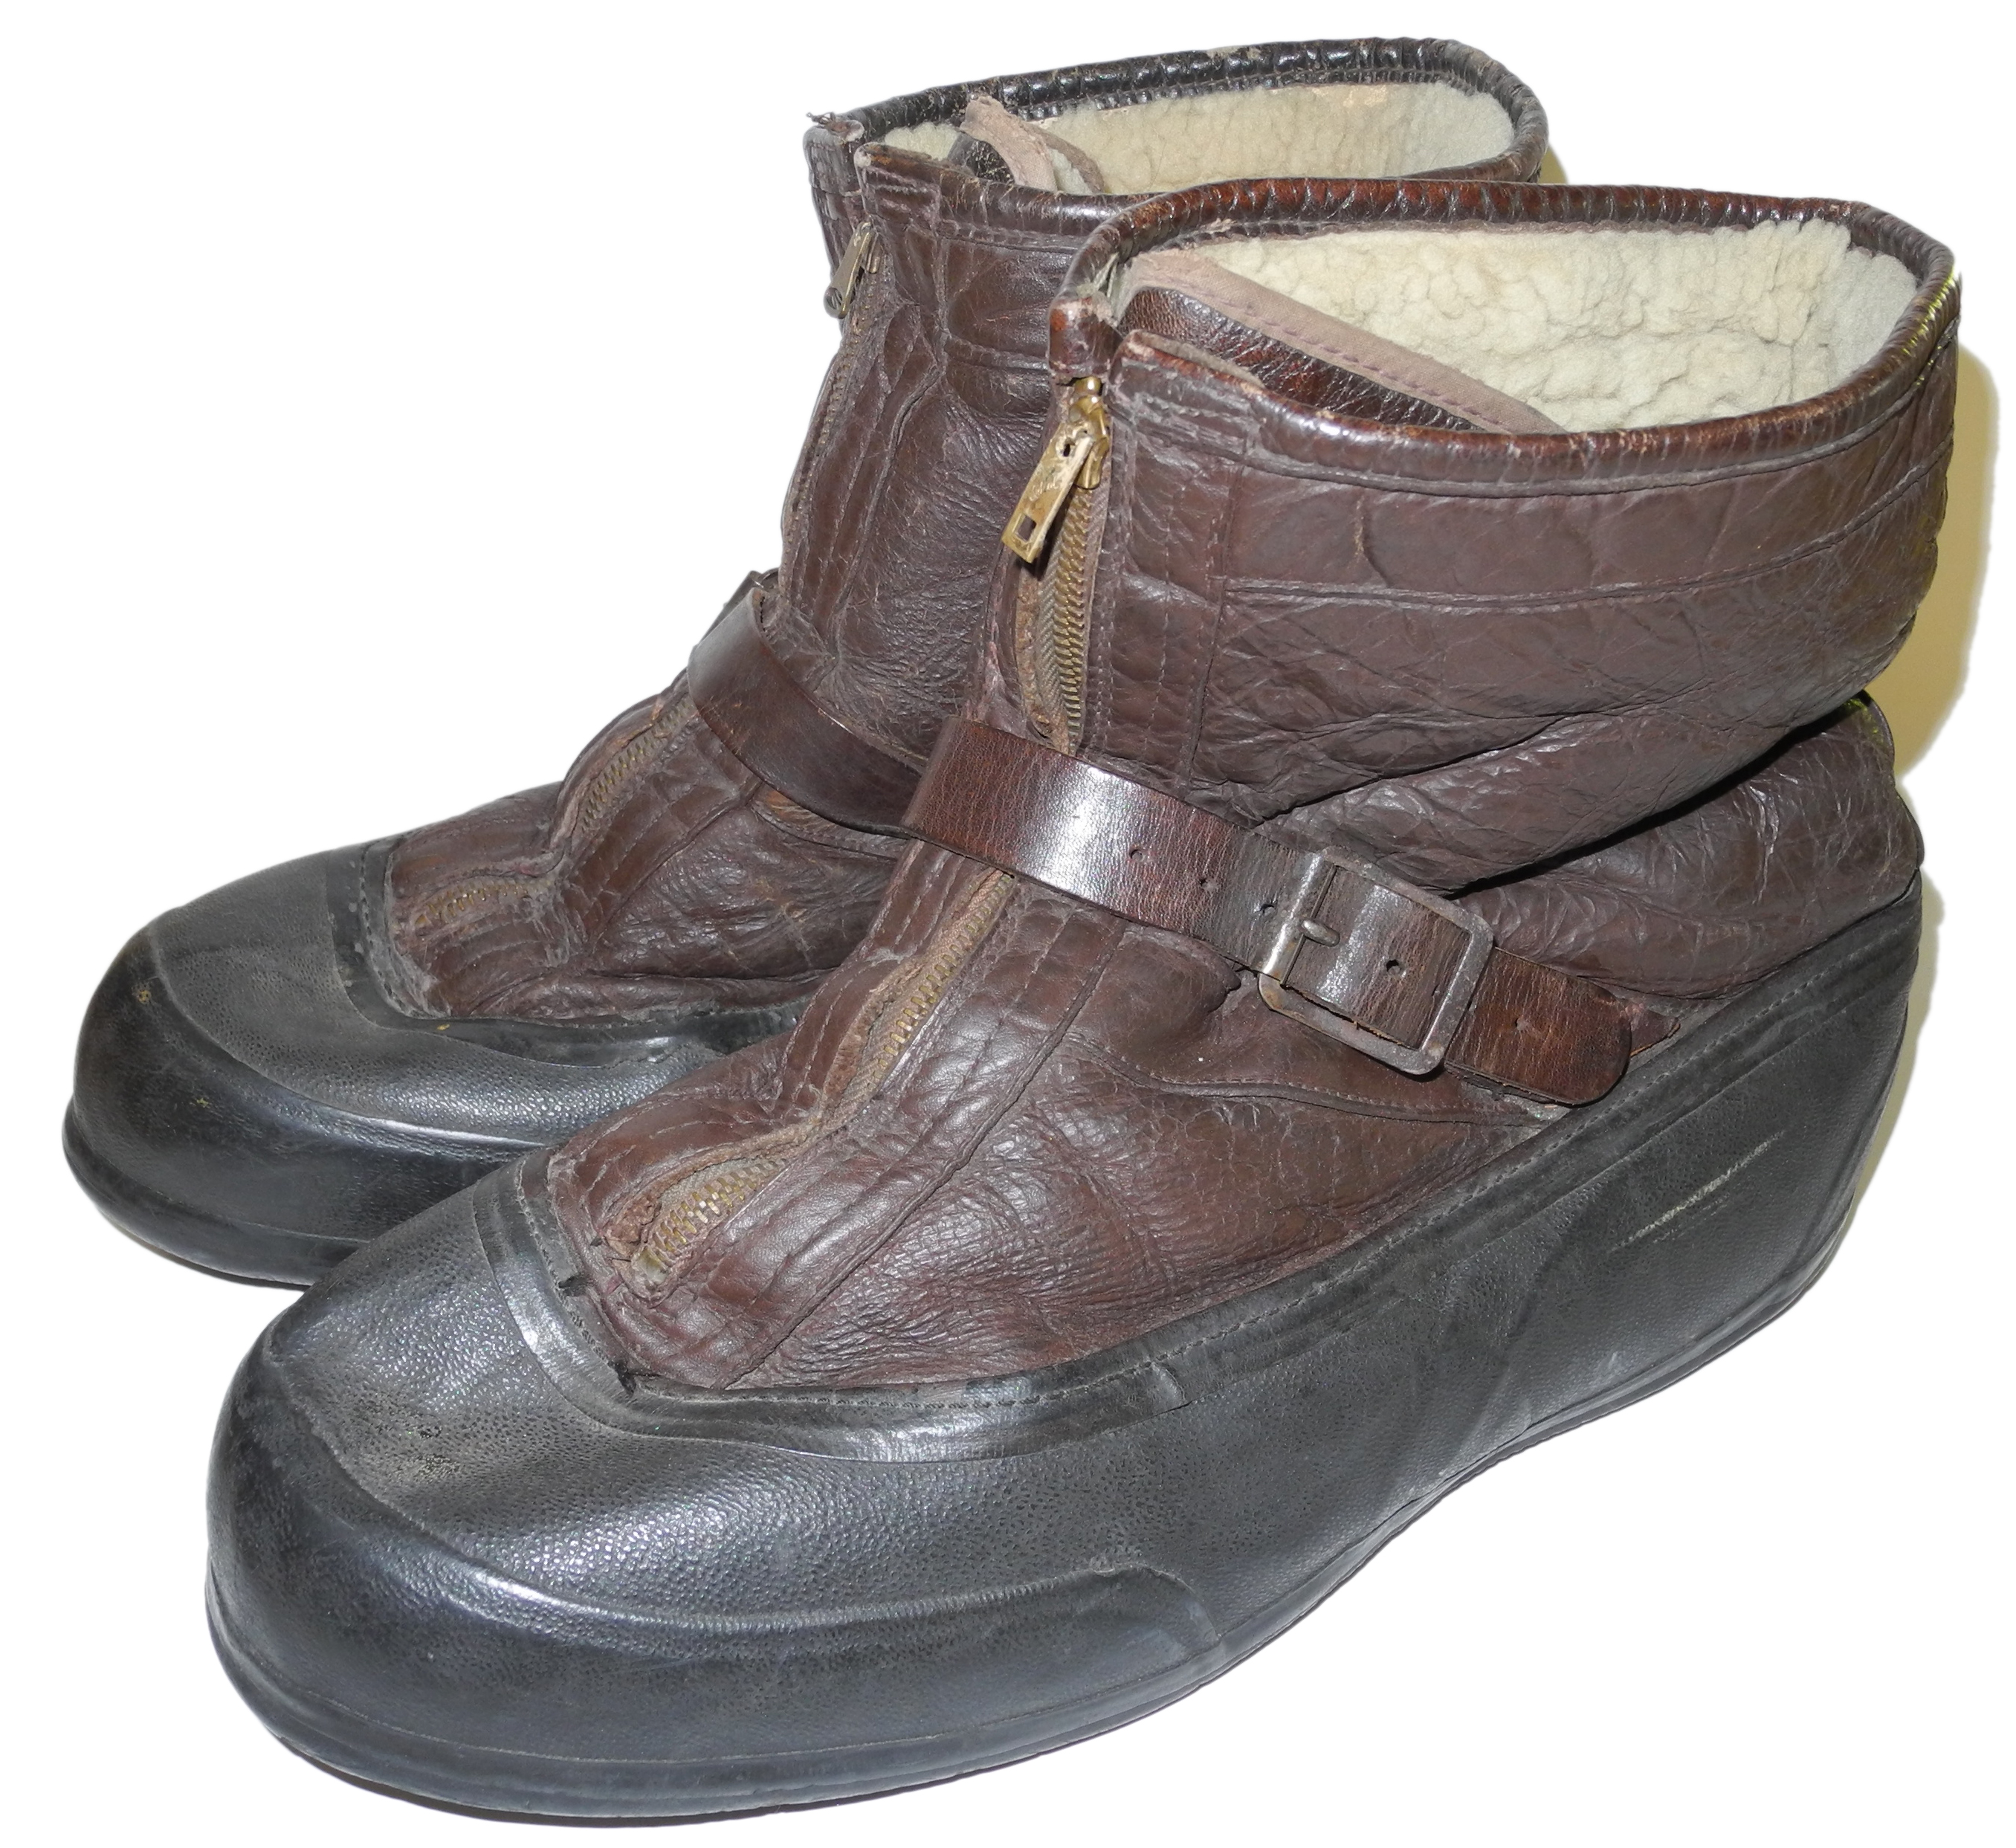 AAF trial A6 boots